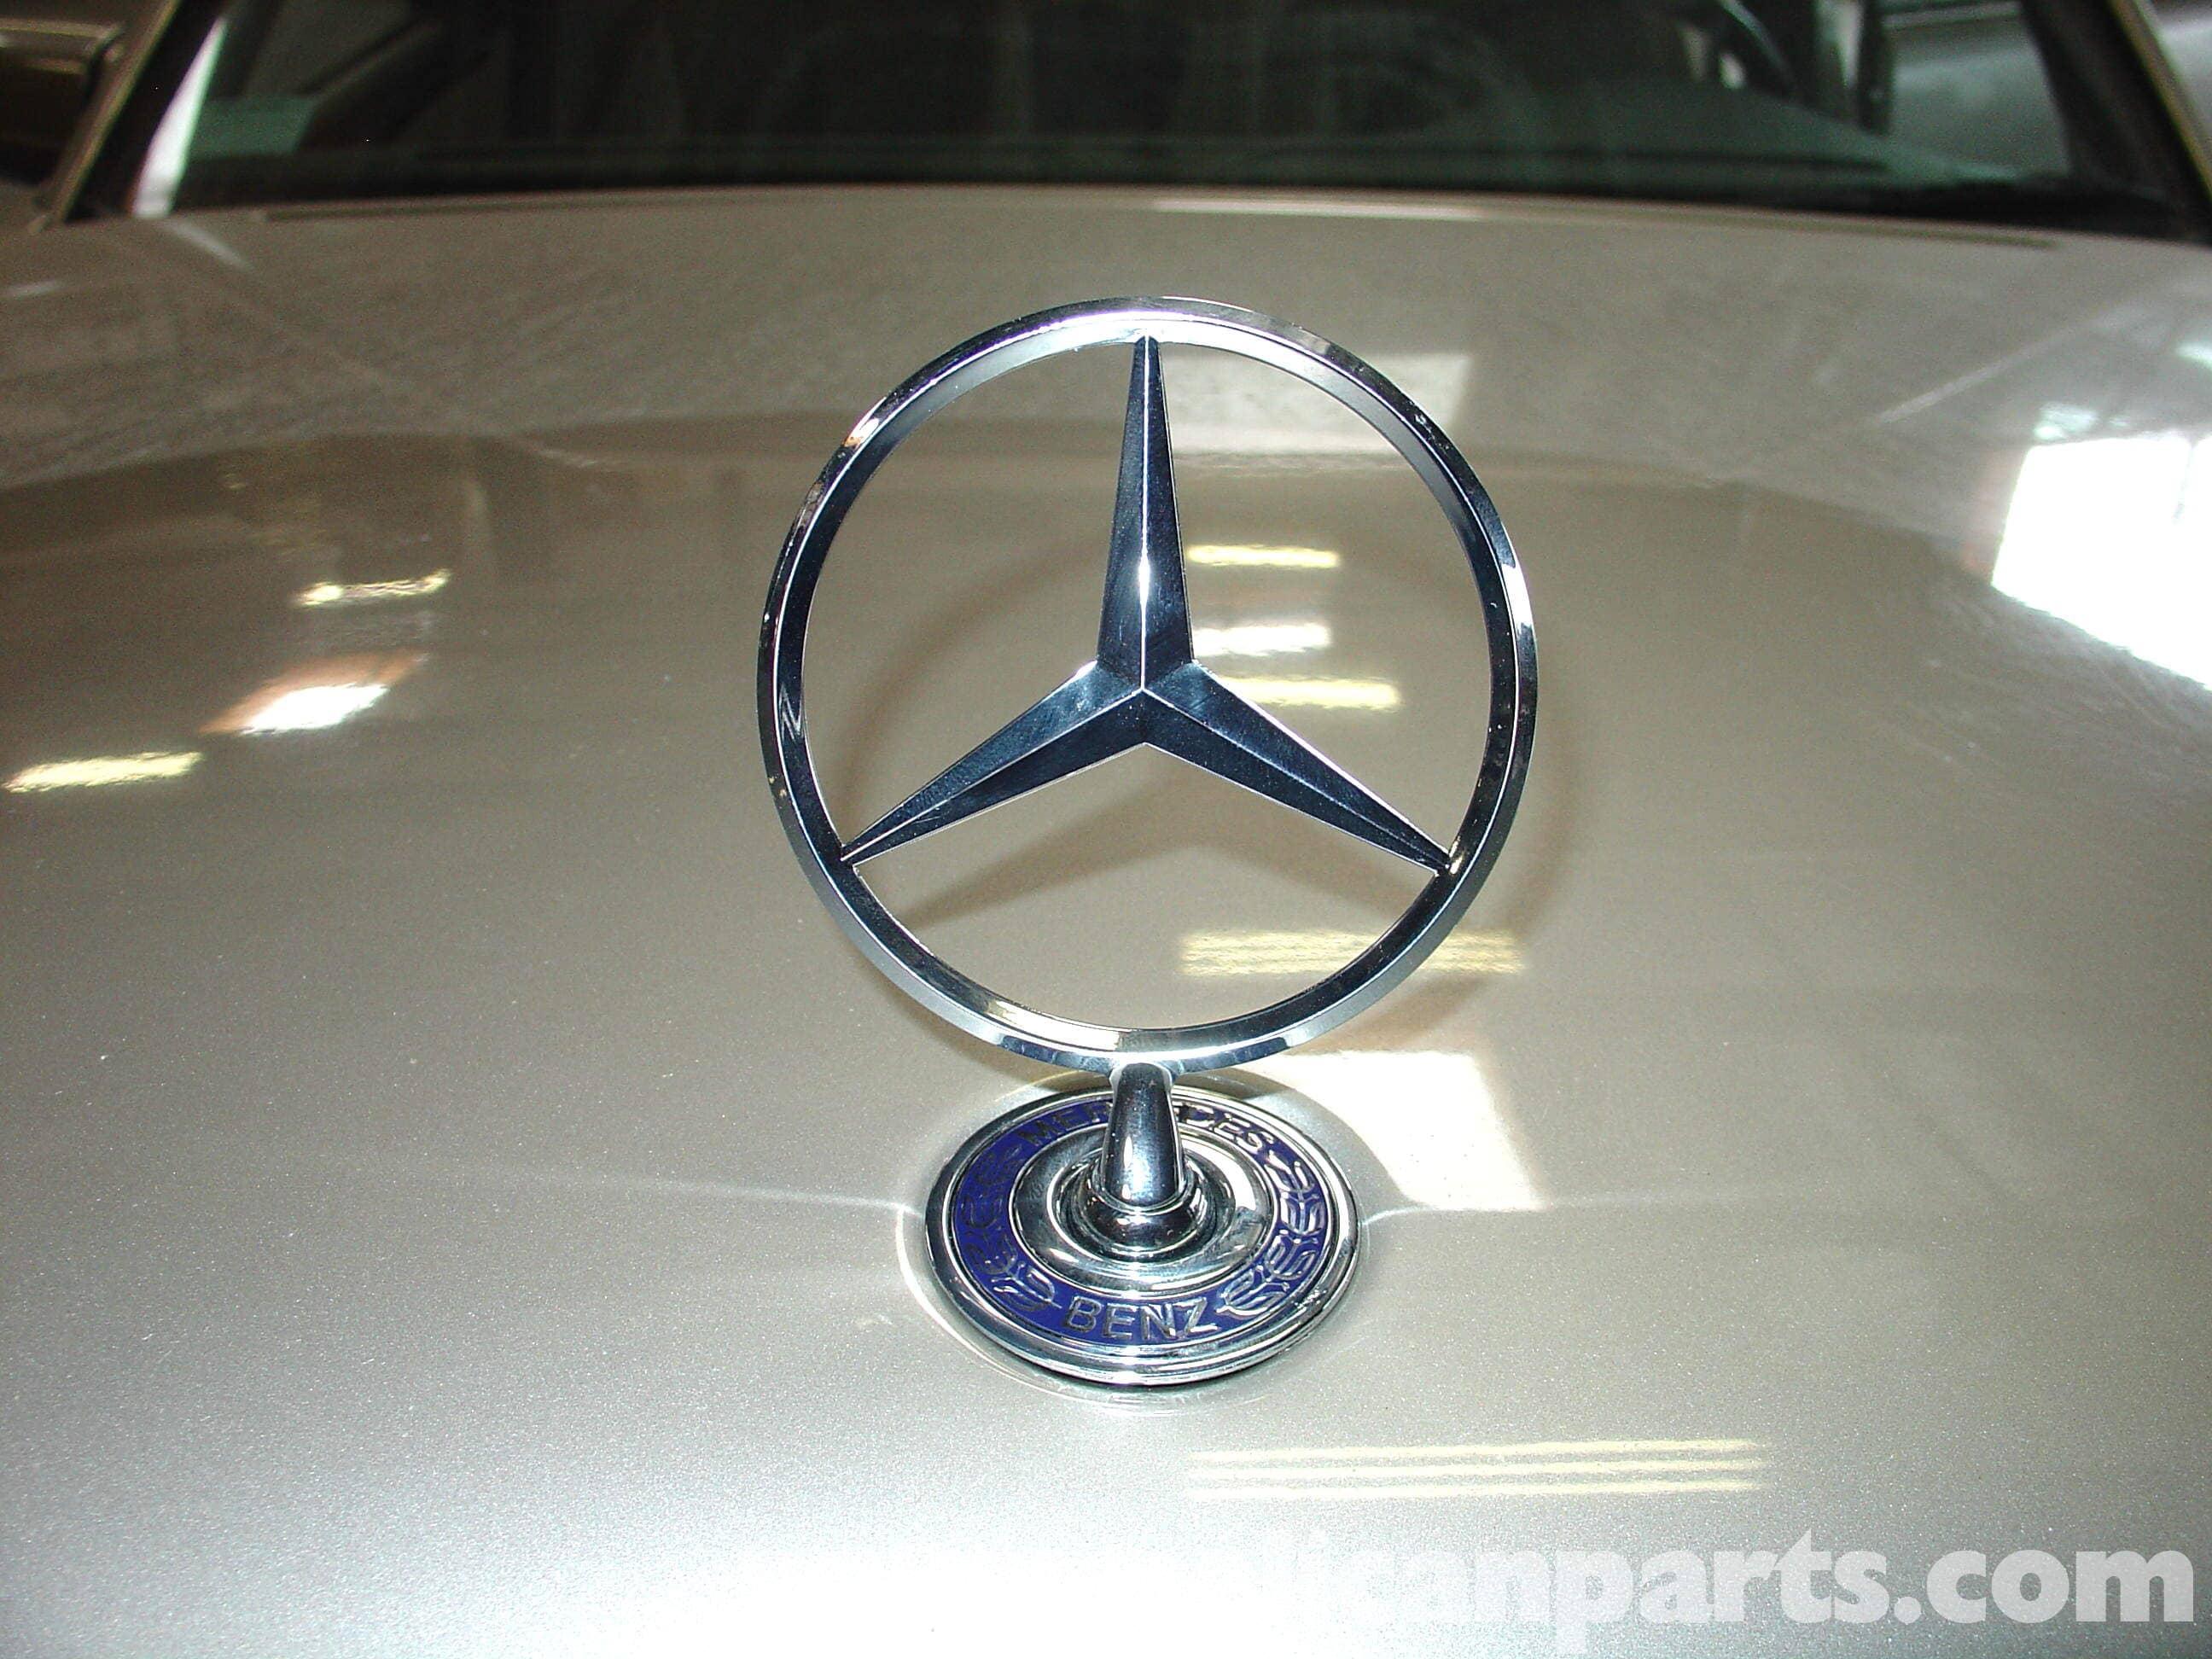 Mercedes benz hood ornament replacement